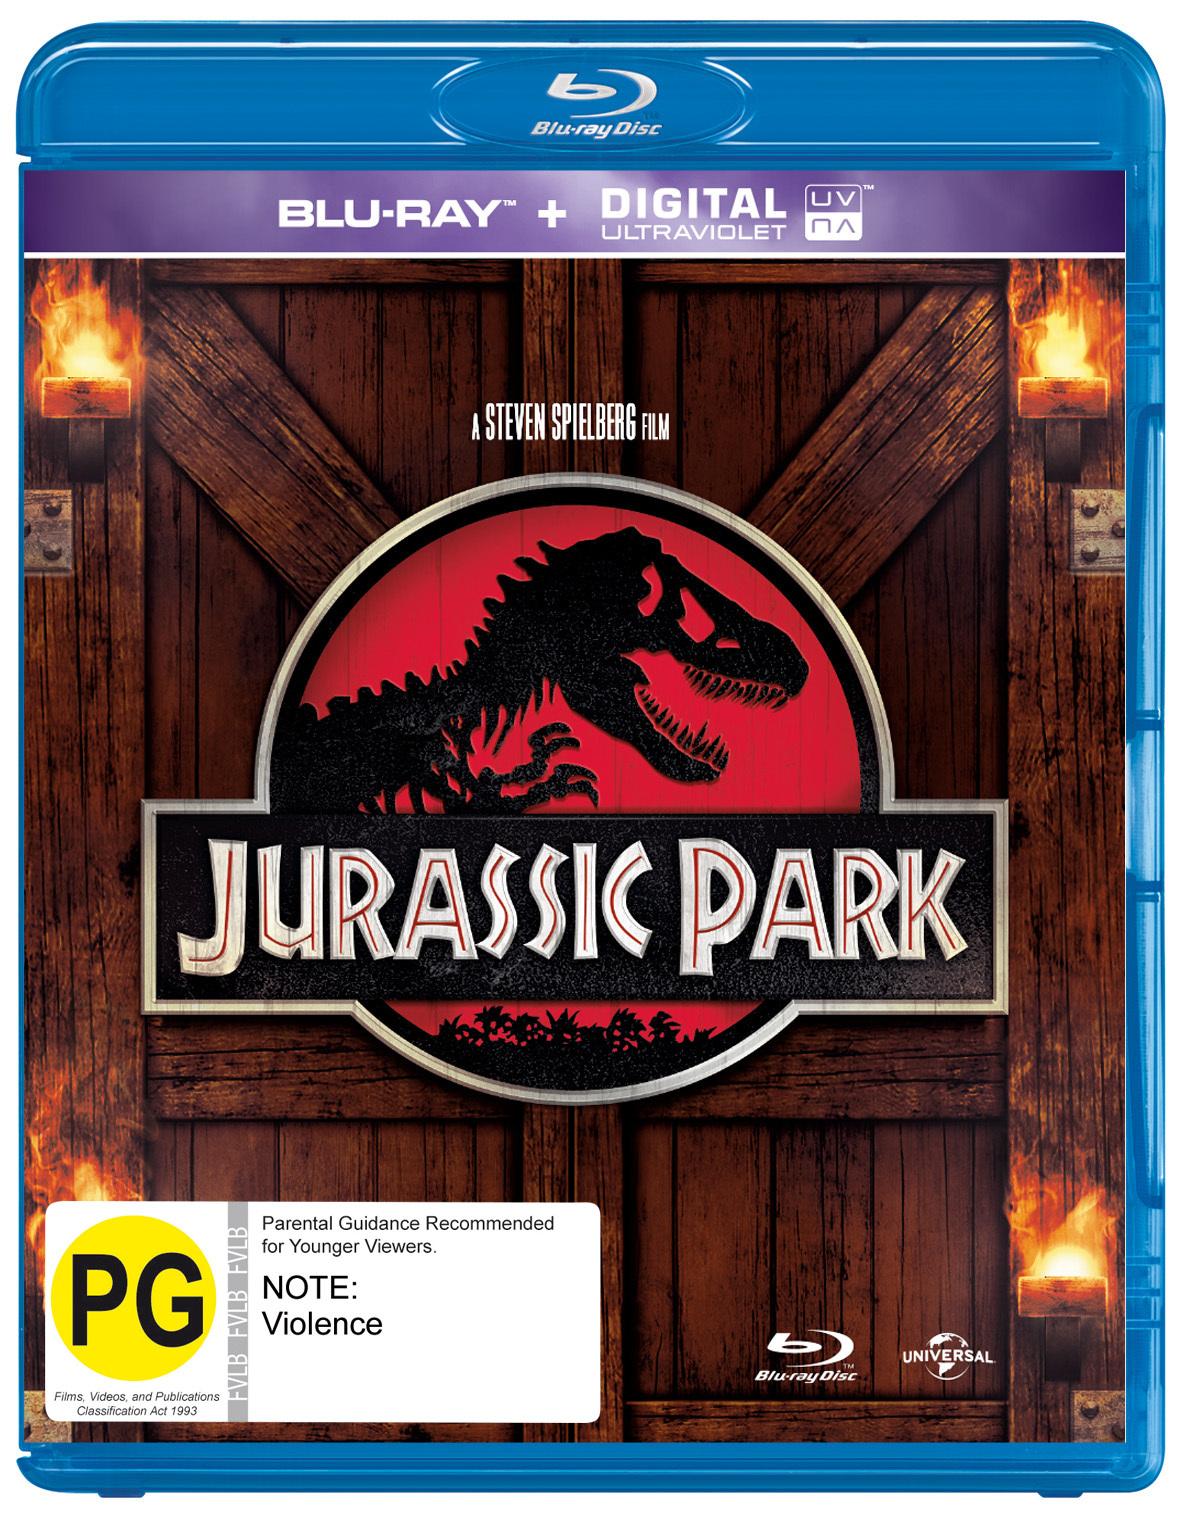 Jurassic Park on Blu-ray image